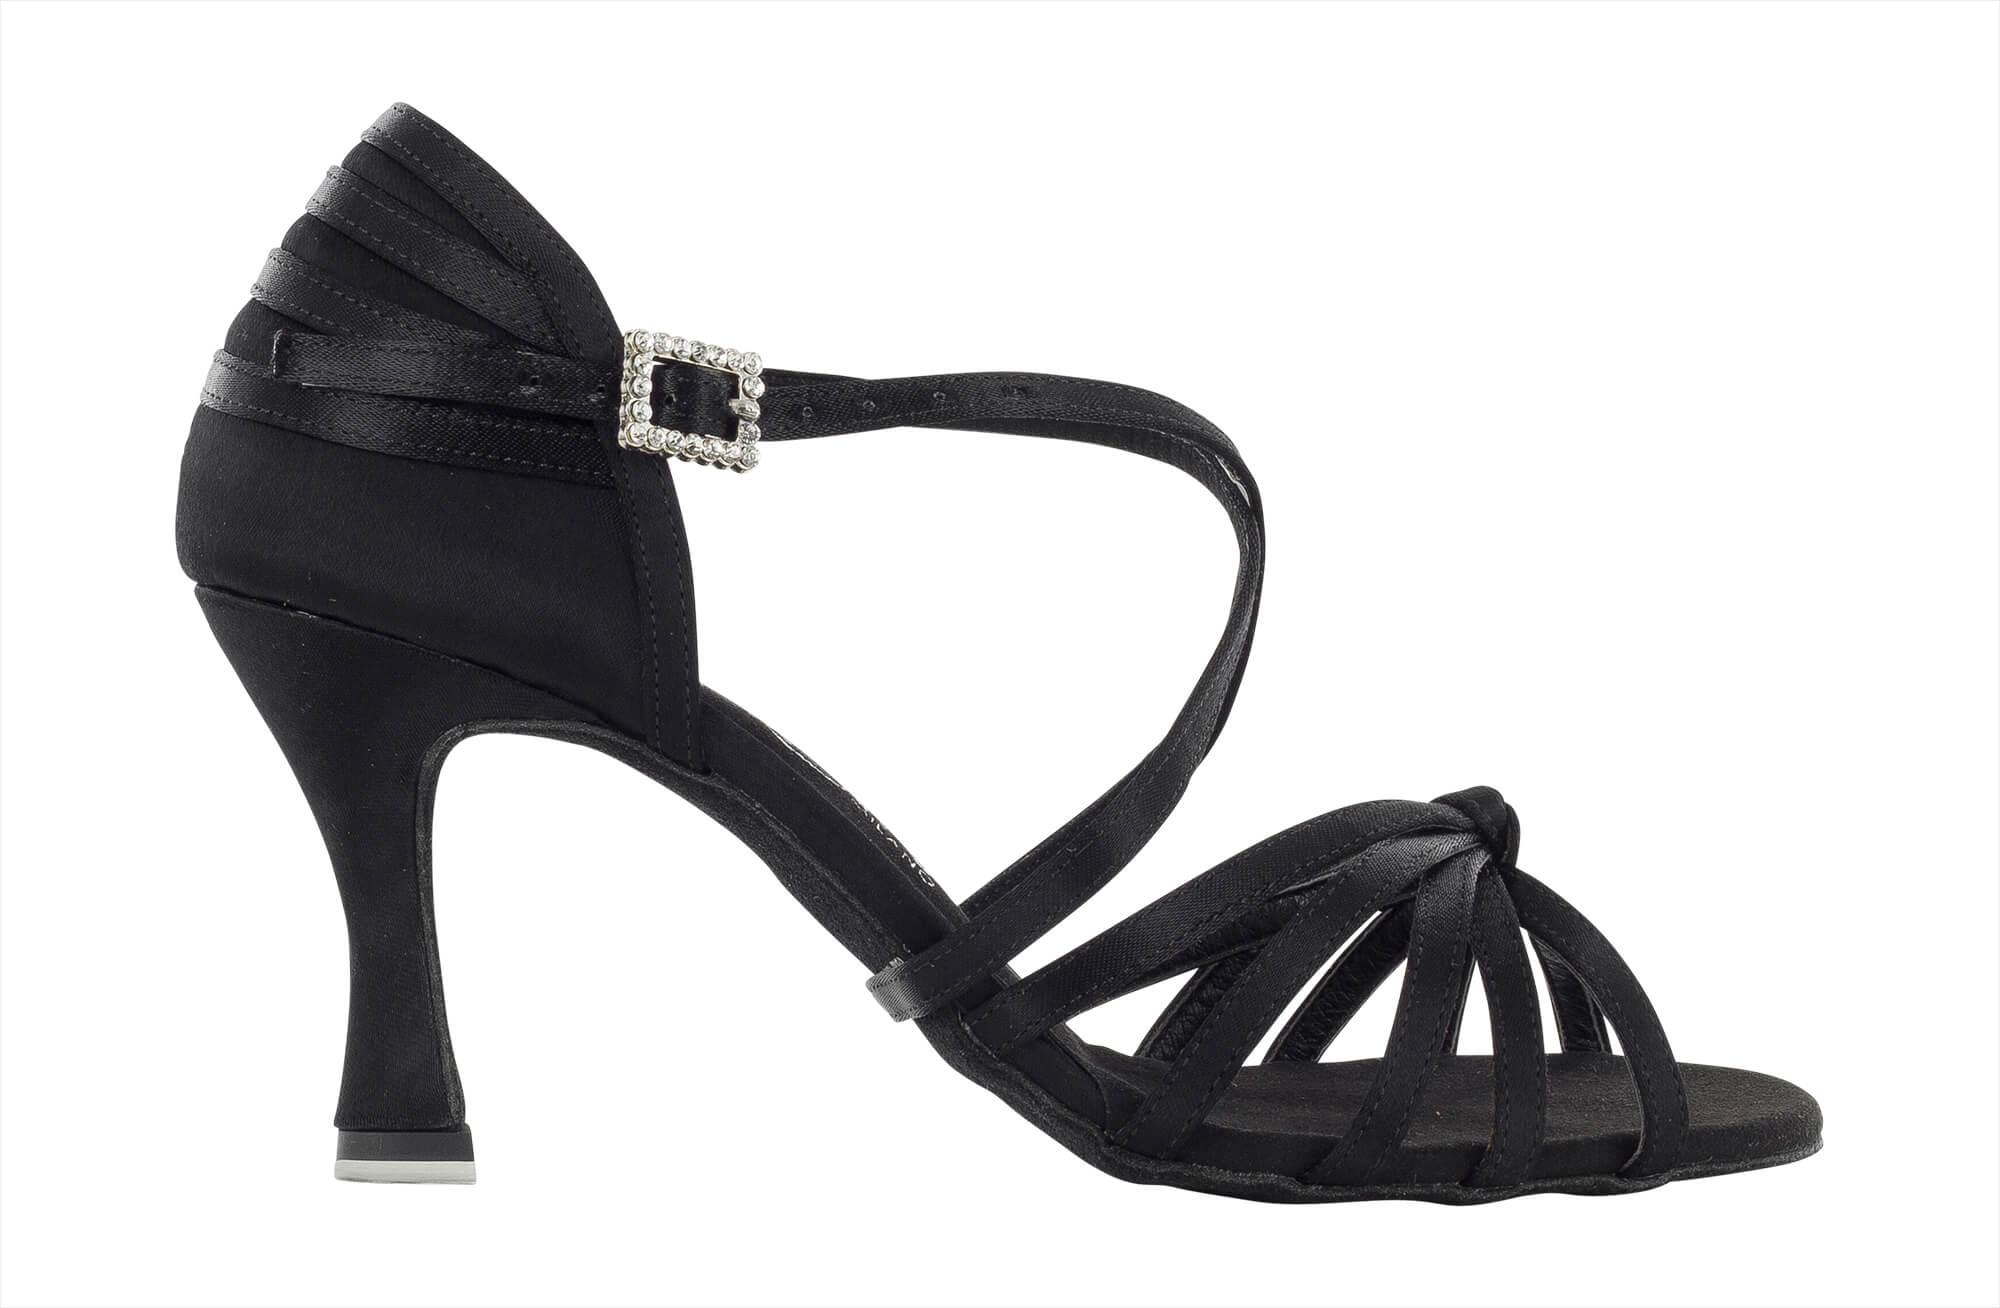 Zapato de baile Danc'in de Raso Negro con Nudo en Tacón de 7'5cm